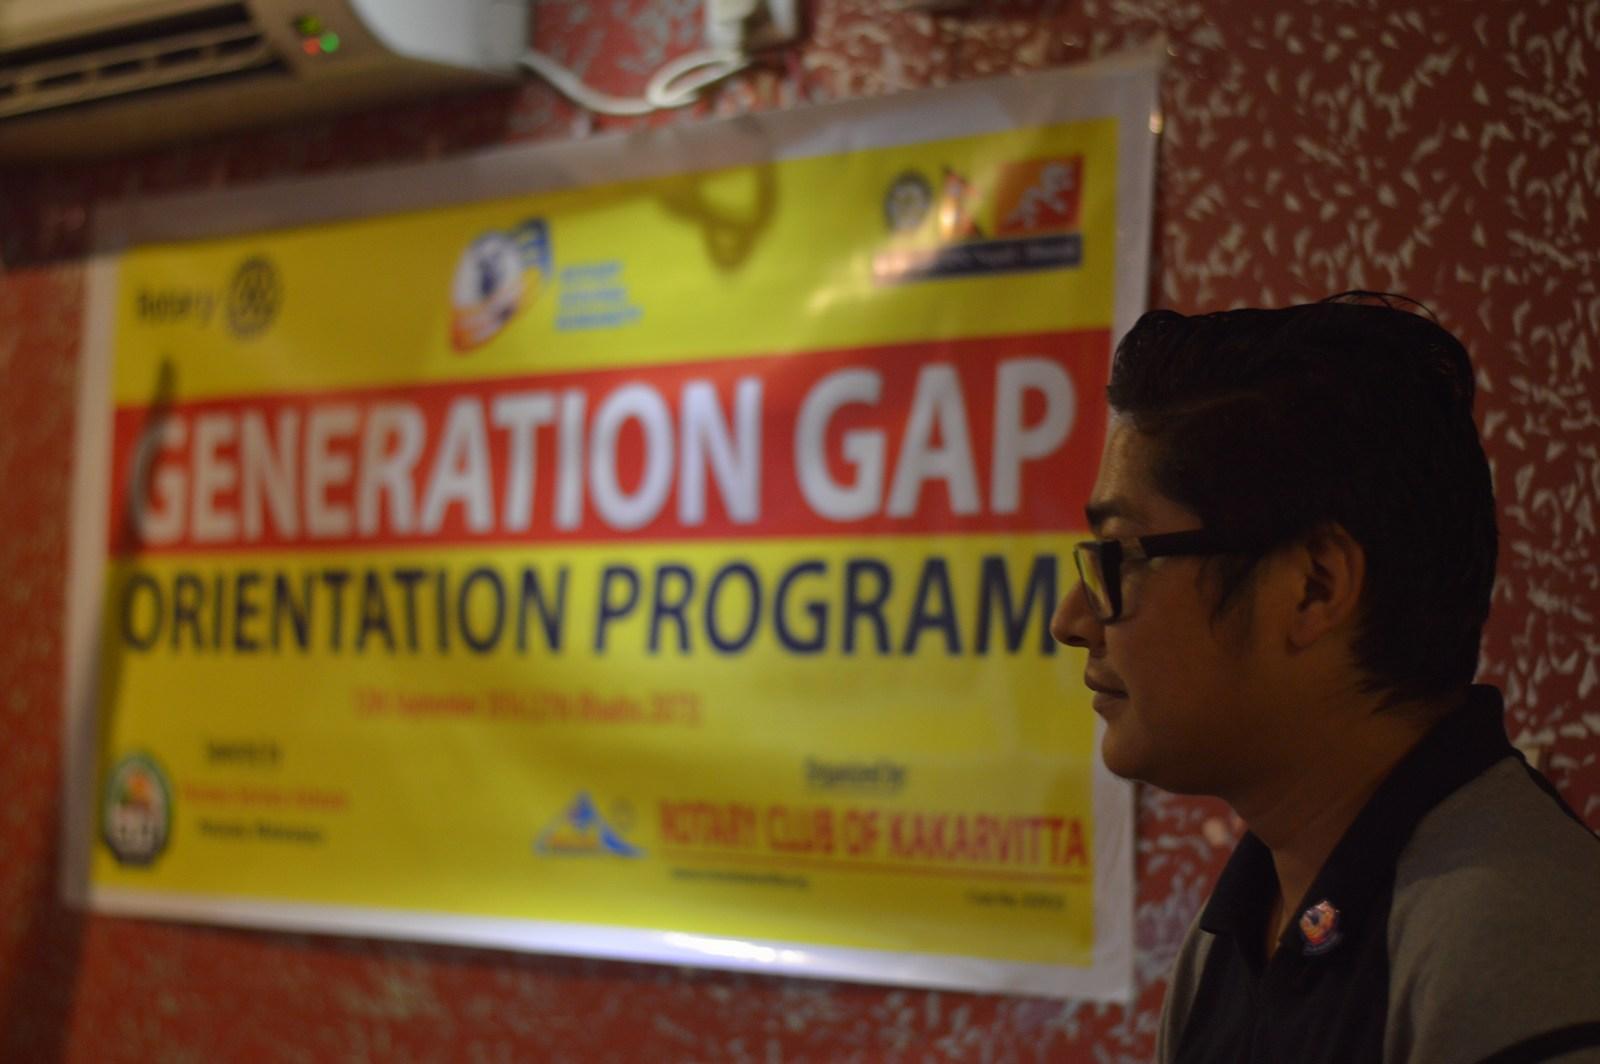 Generation-Gap-Orientation-Program-Rotary-Club-of-Kakarvitta-24